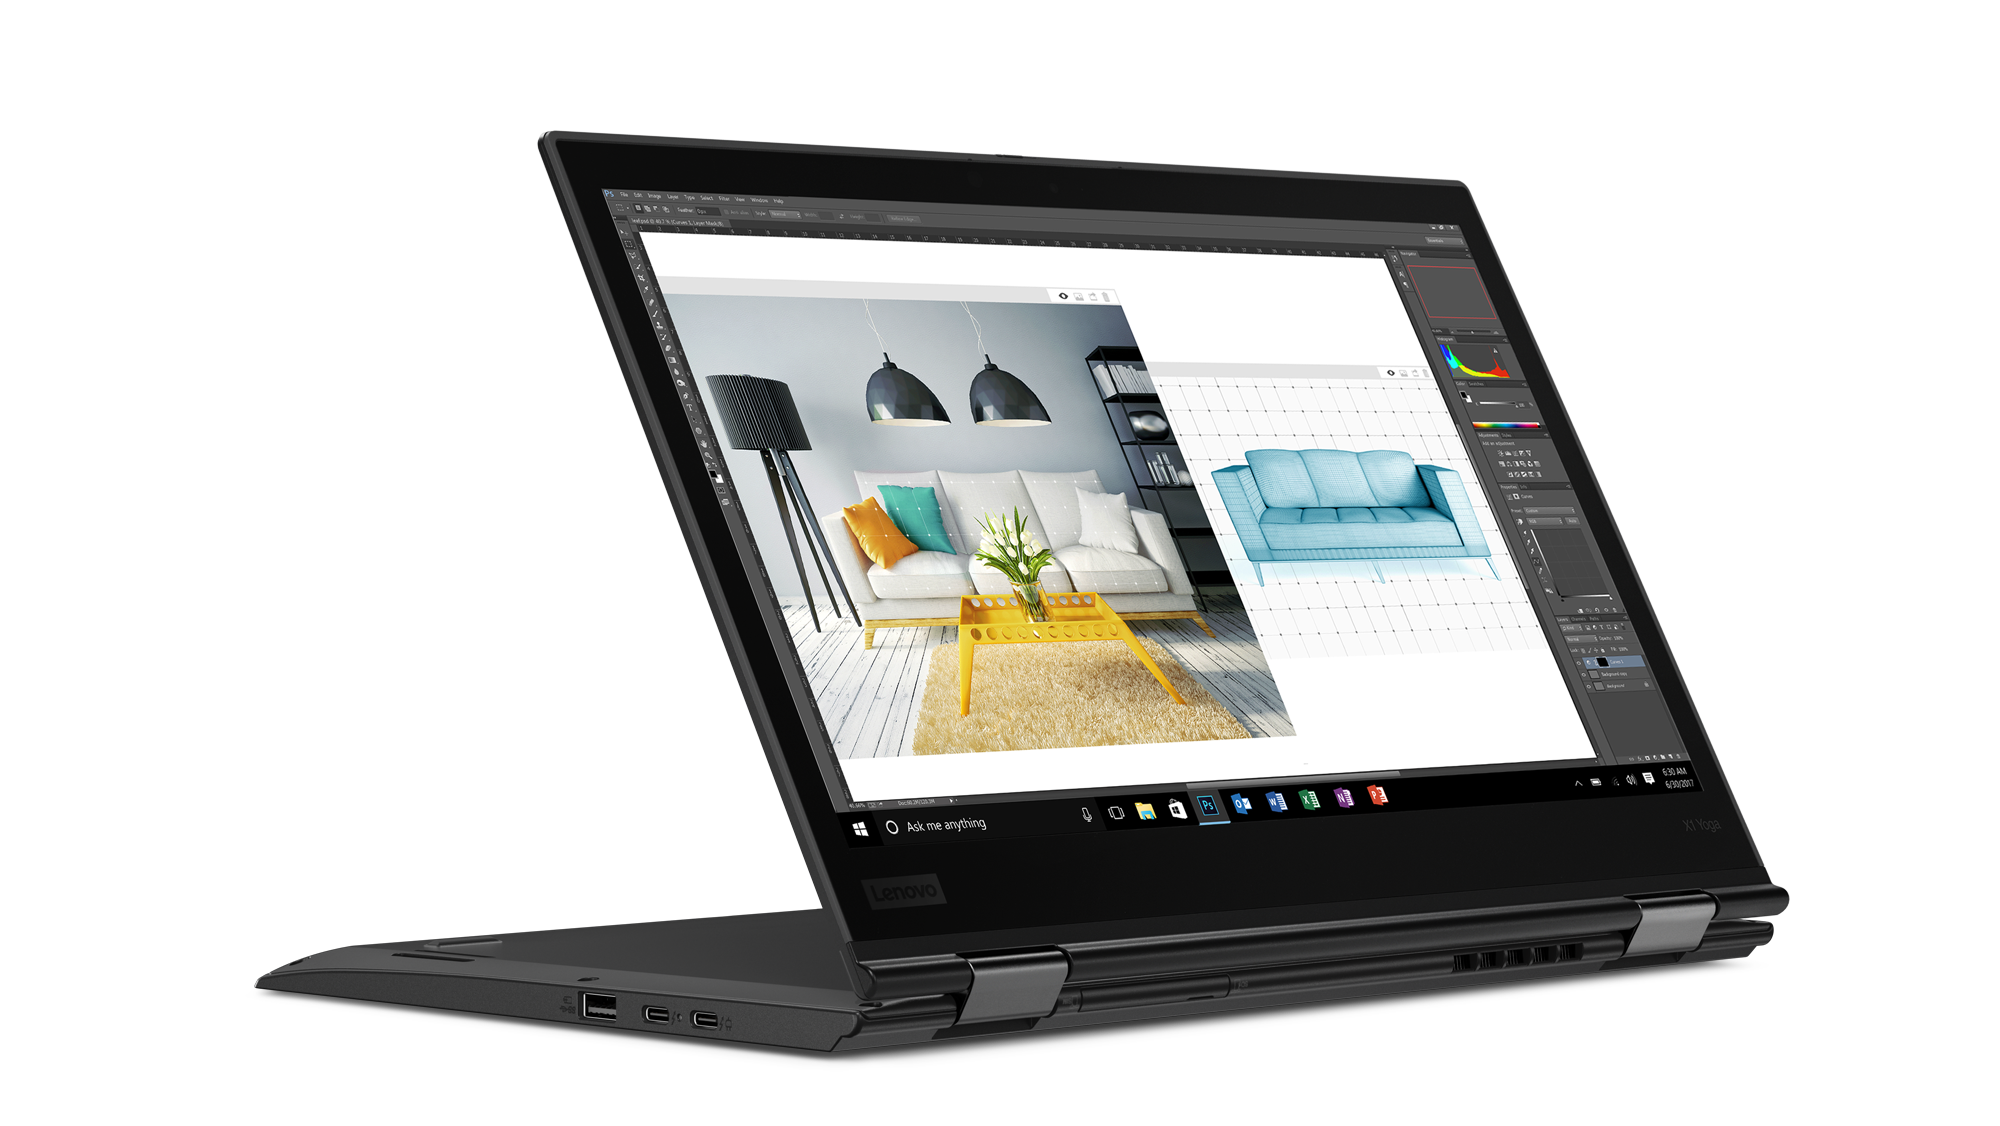 Lenovo Thinkpad X1: Dolby Vision für das Yoga, 3K-Display für das Tablet - Lenovo Thinkpad X1 Yoga(Bild: Lenovo)